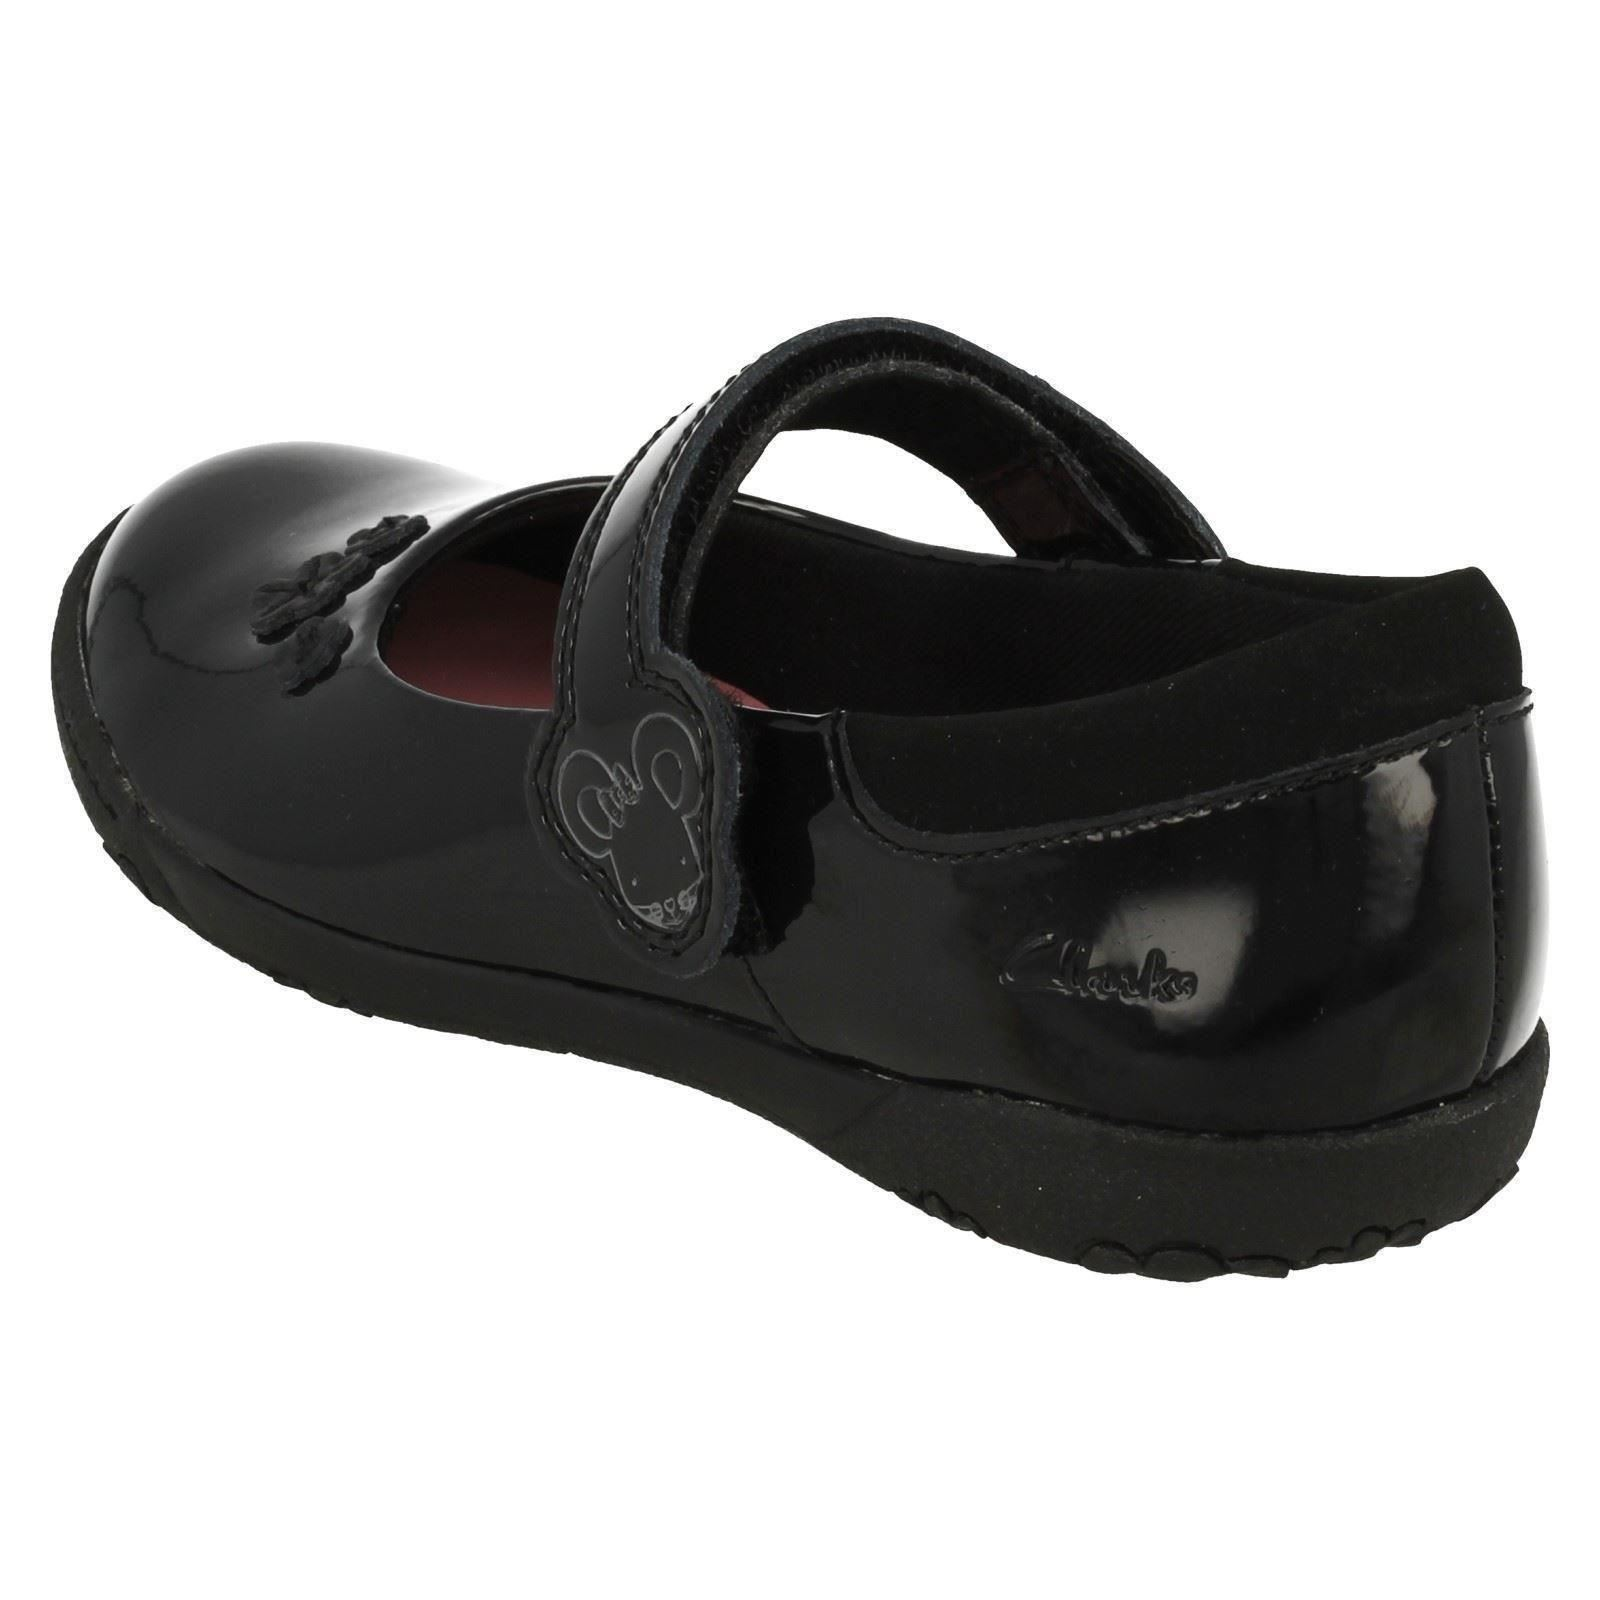 Sal Patente School Niñas Negro Zapatos Nibbles Smart Clarks Binkies EvWWpw4q